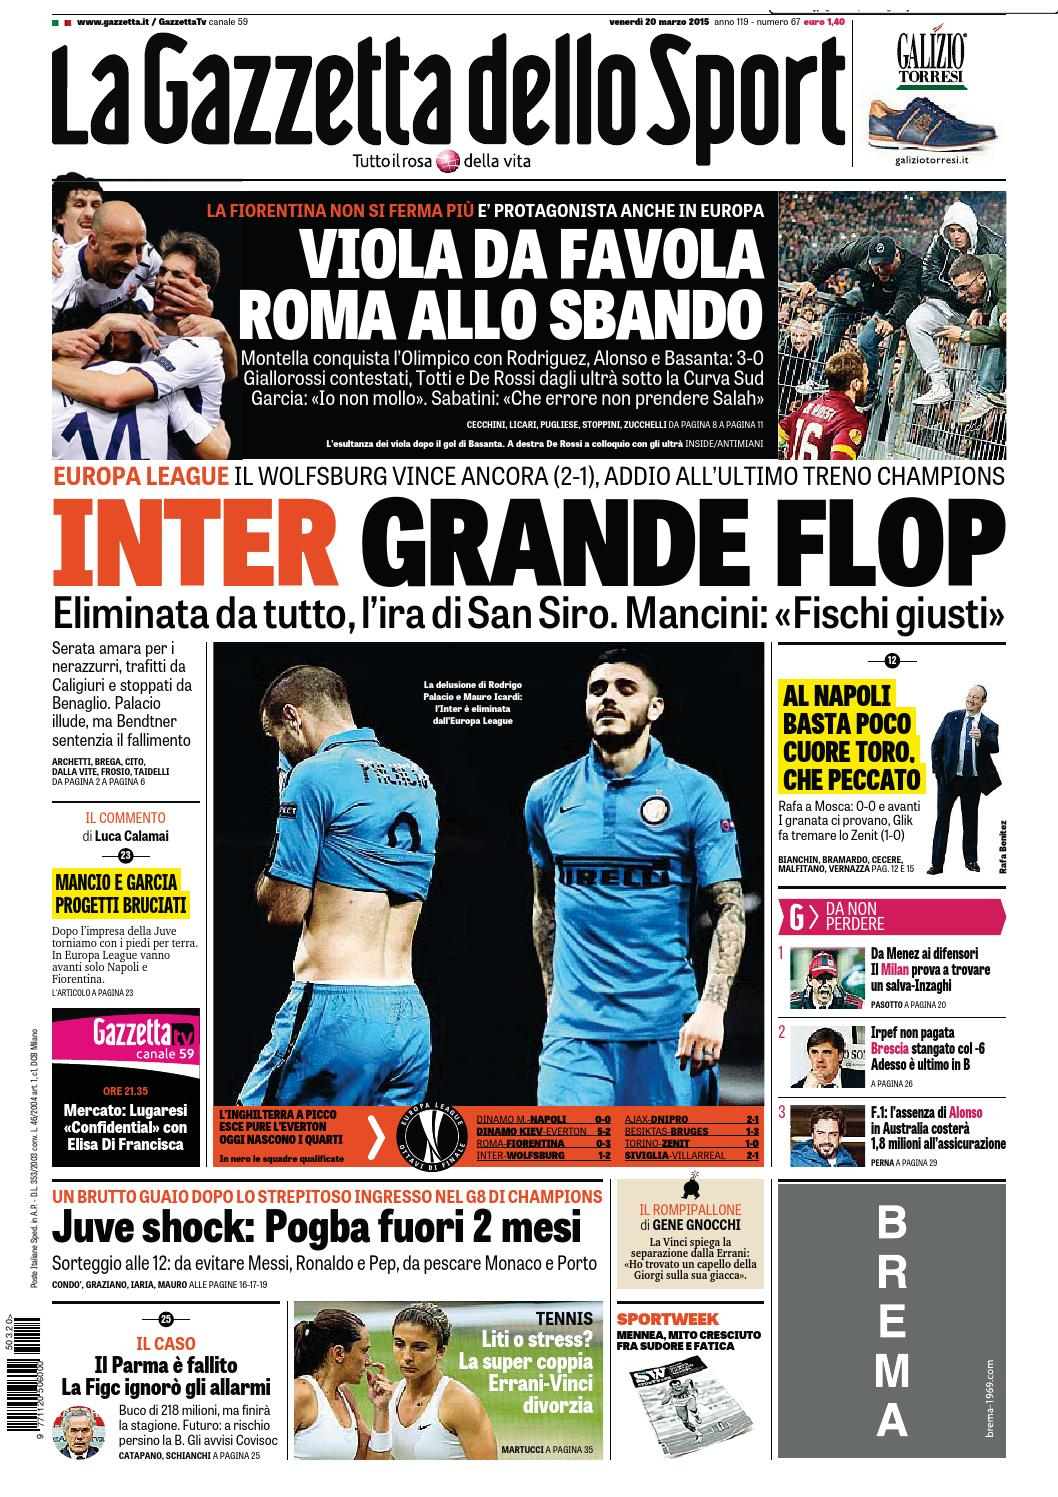 La Gazzetta dello Sport (03-20-2015) by Nguyen Duc Thinh - issuu